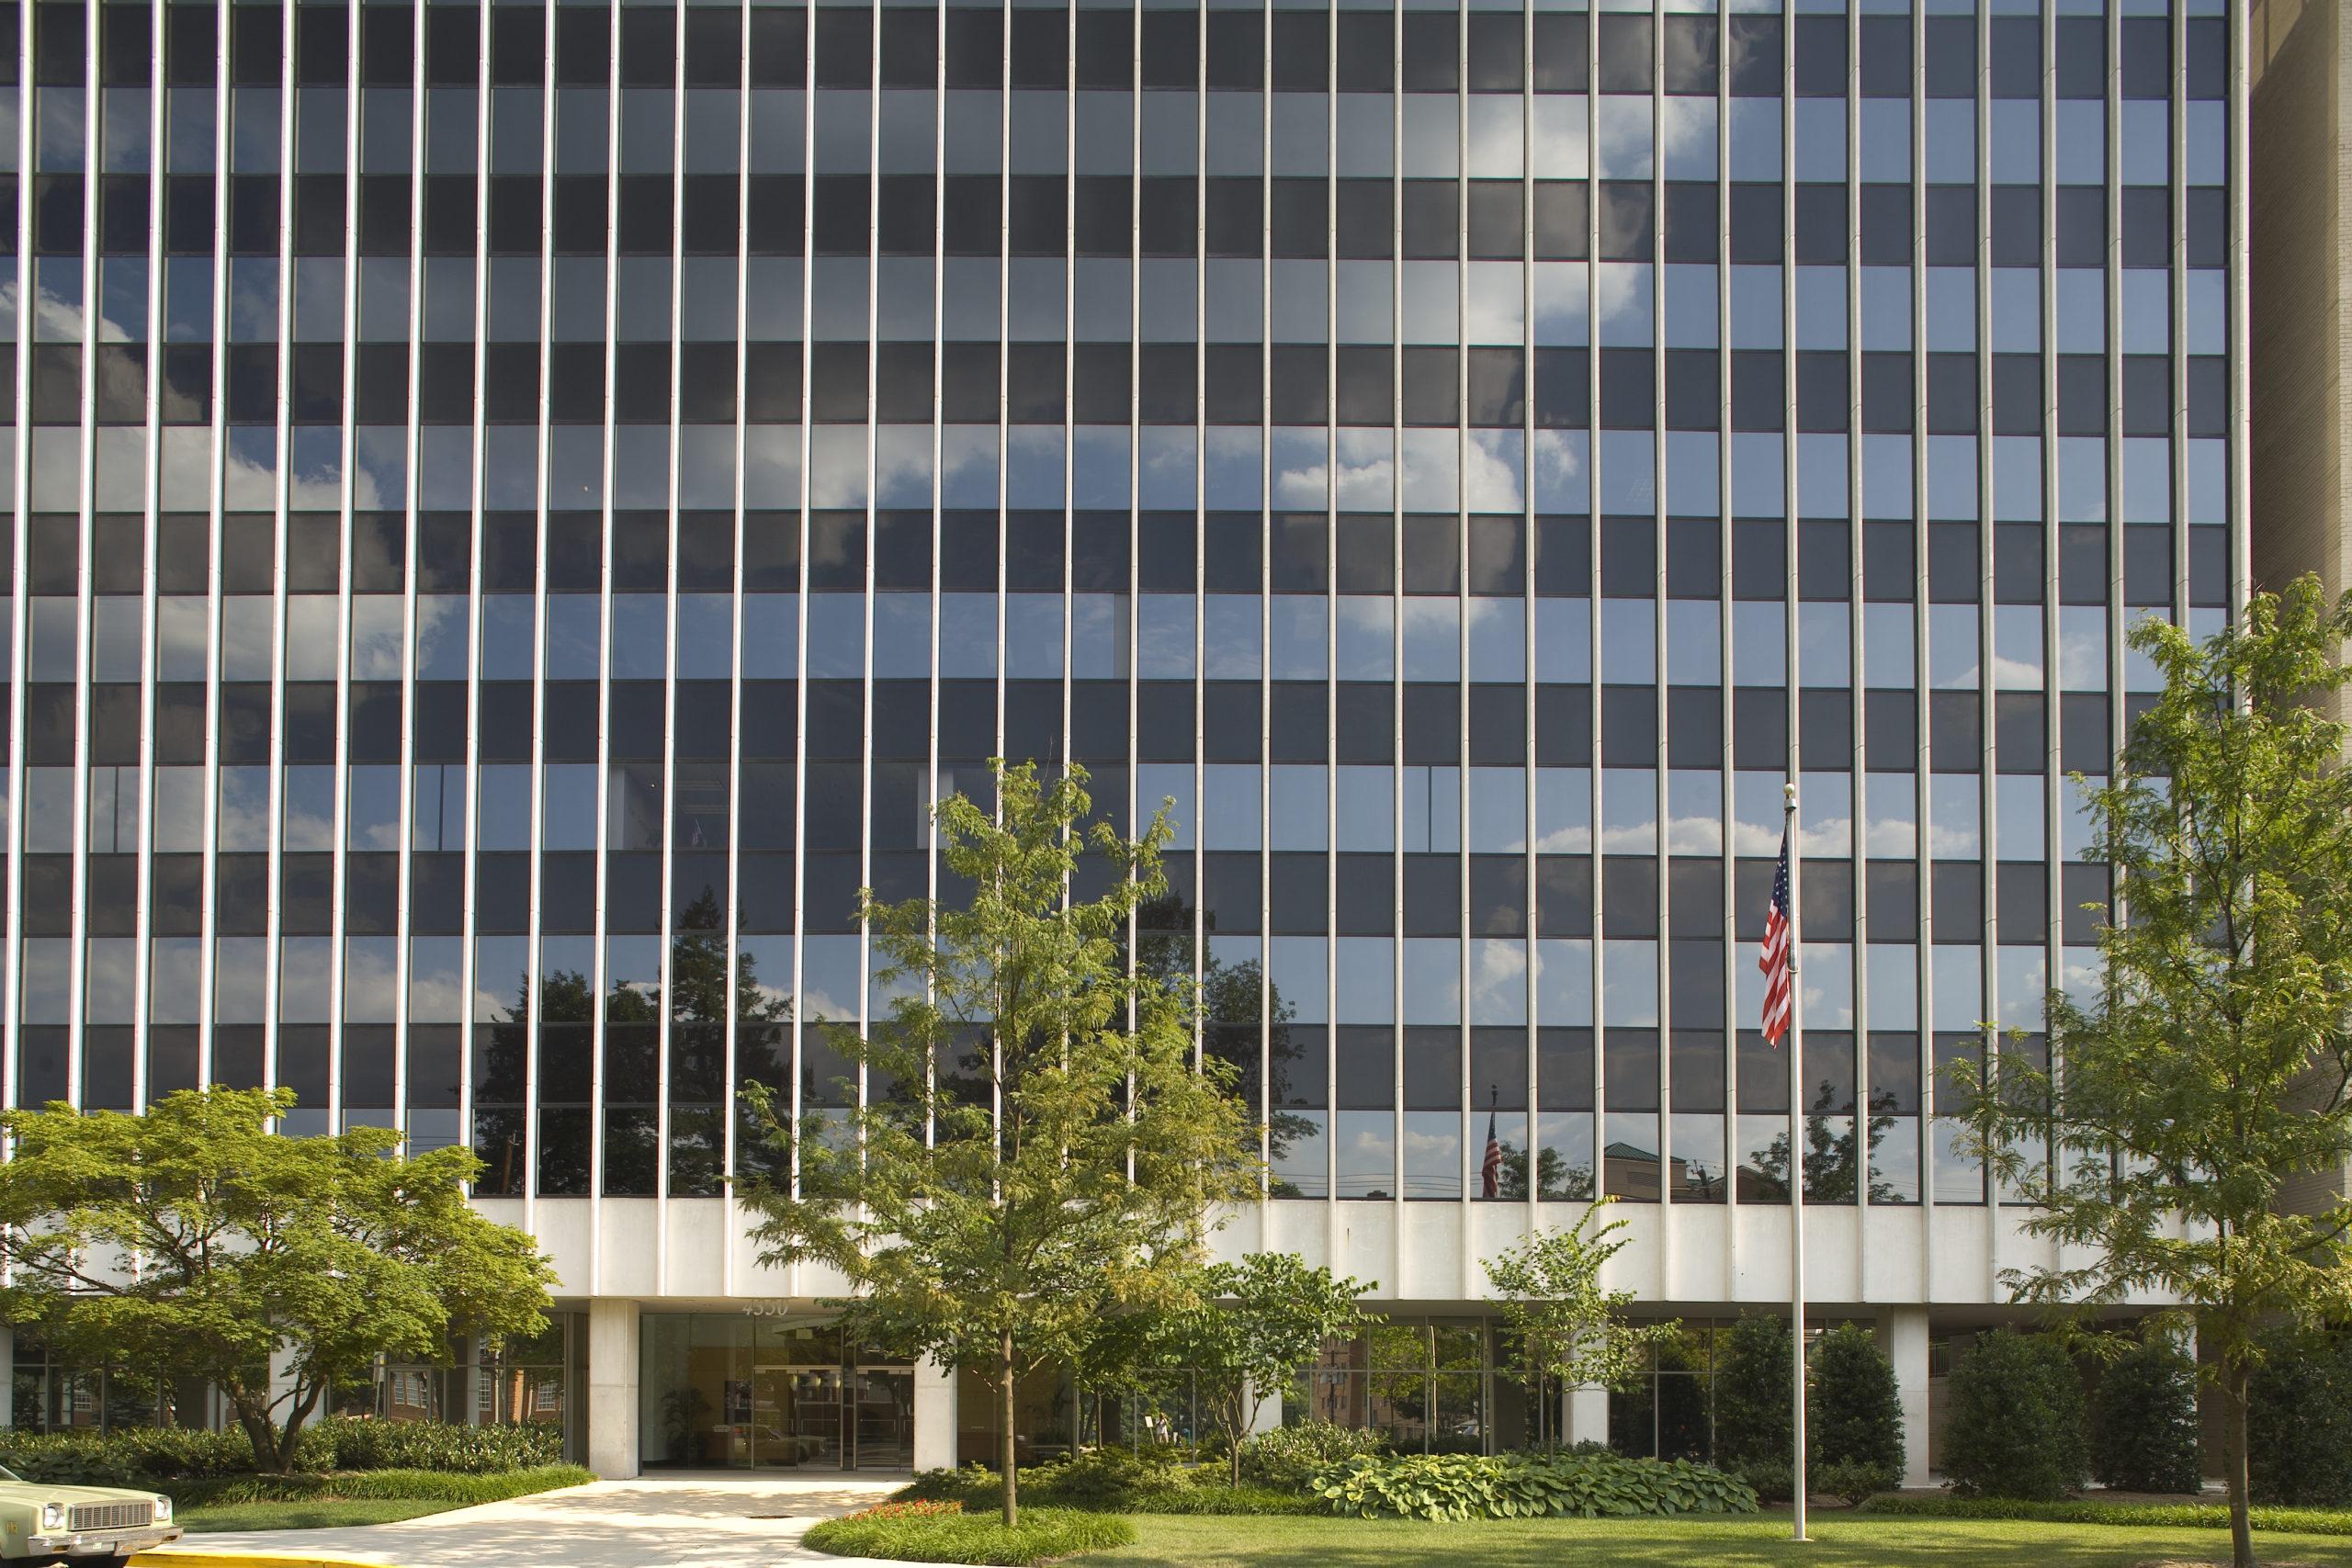 Bethesda Towers